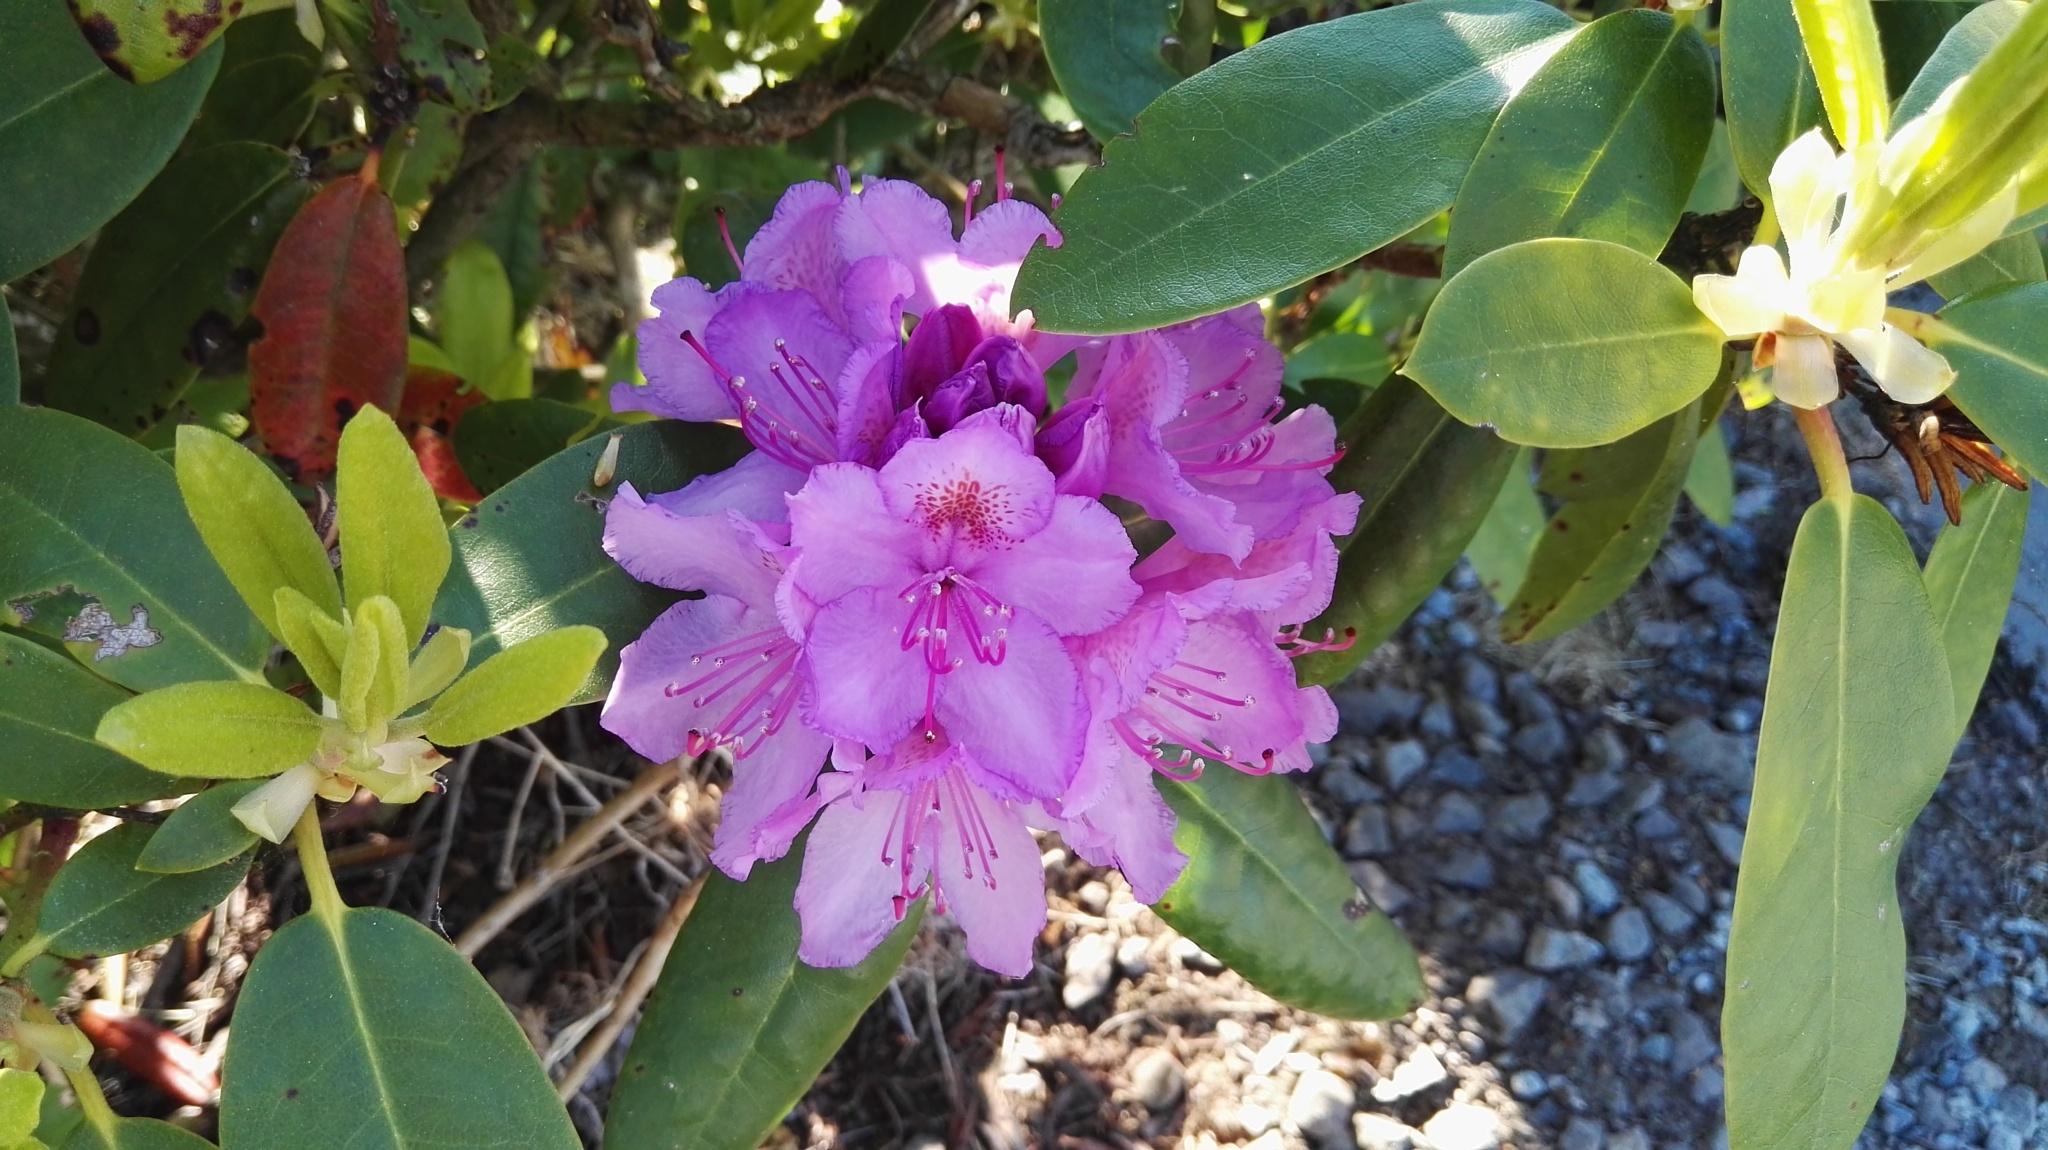 Purple Rhododendron by Lars-Toralf Utnes Storstrand